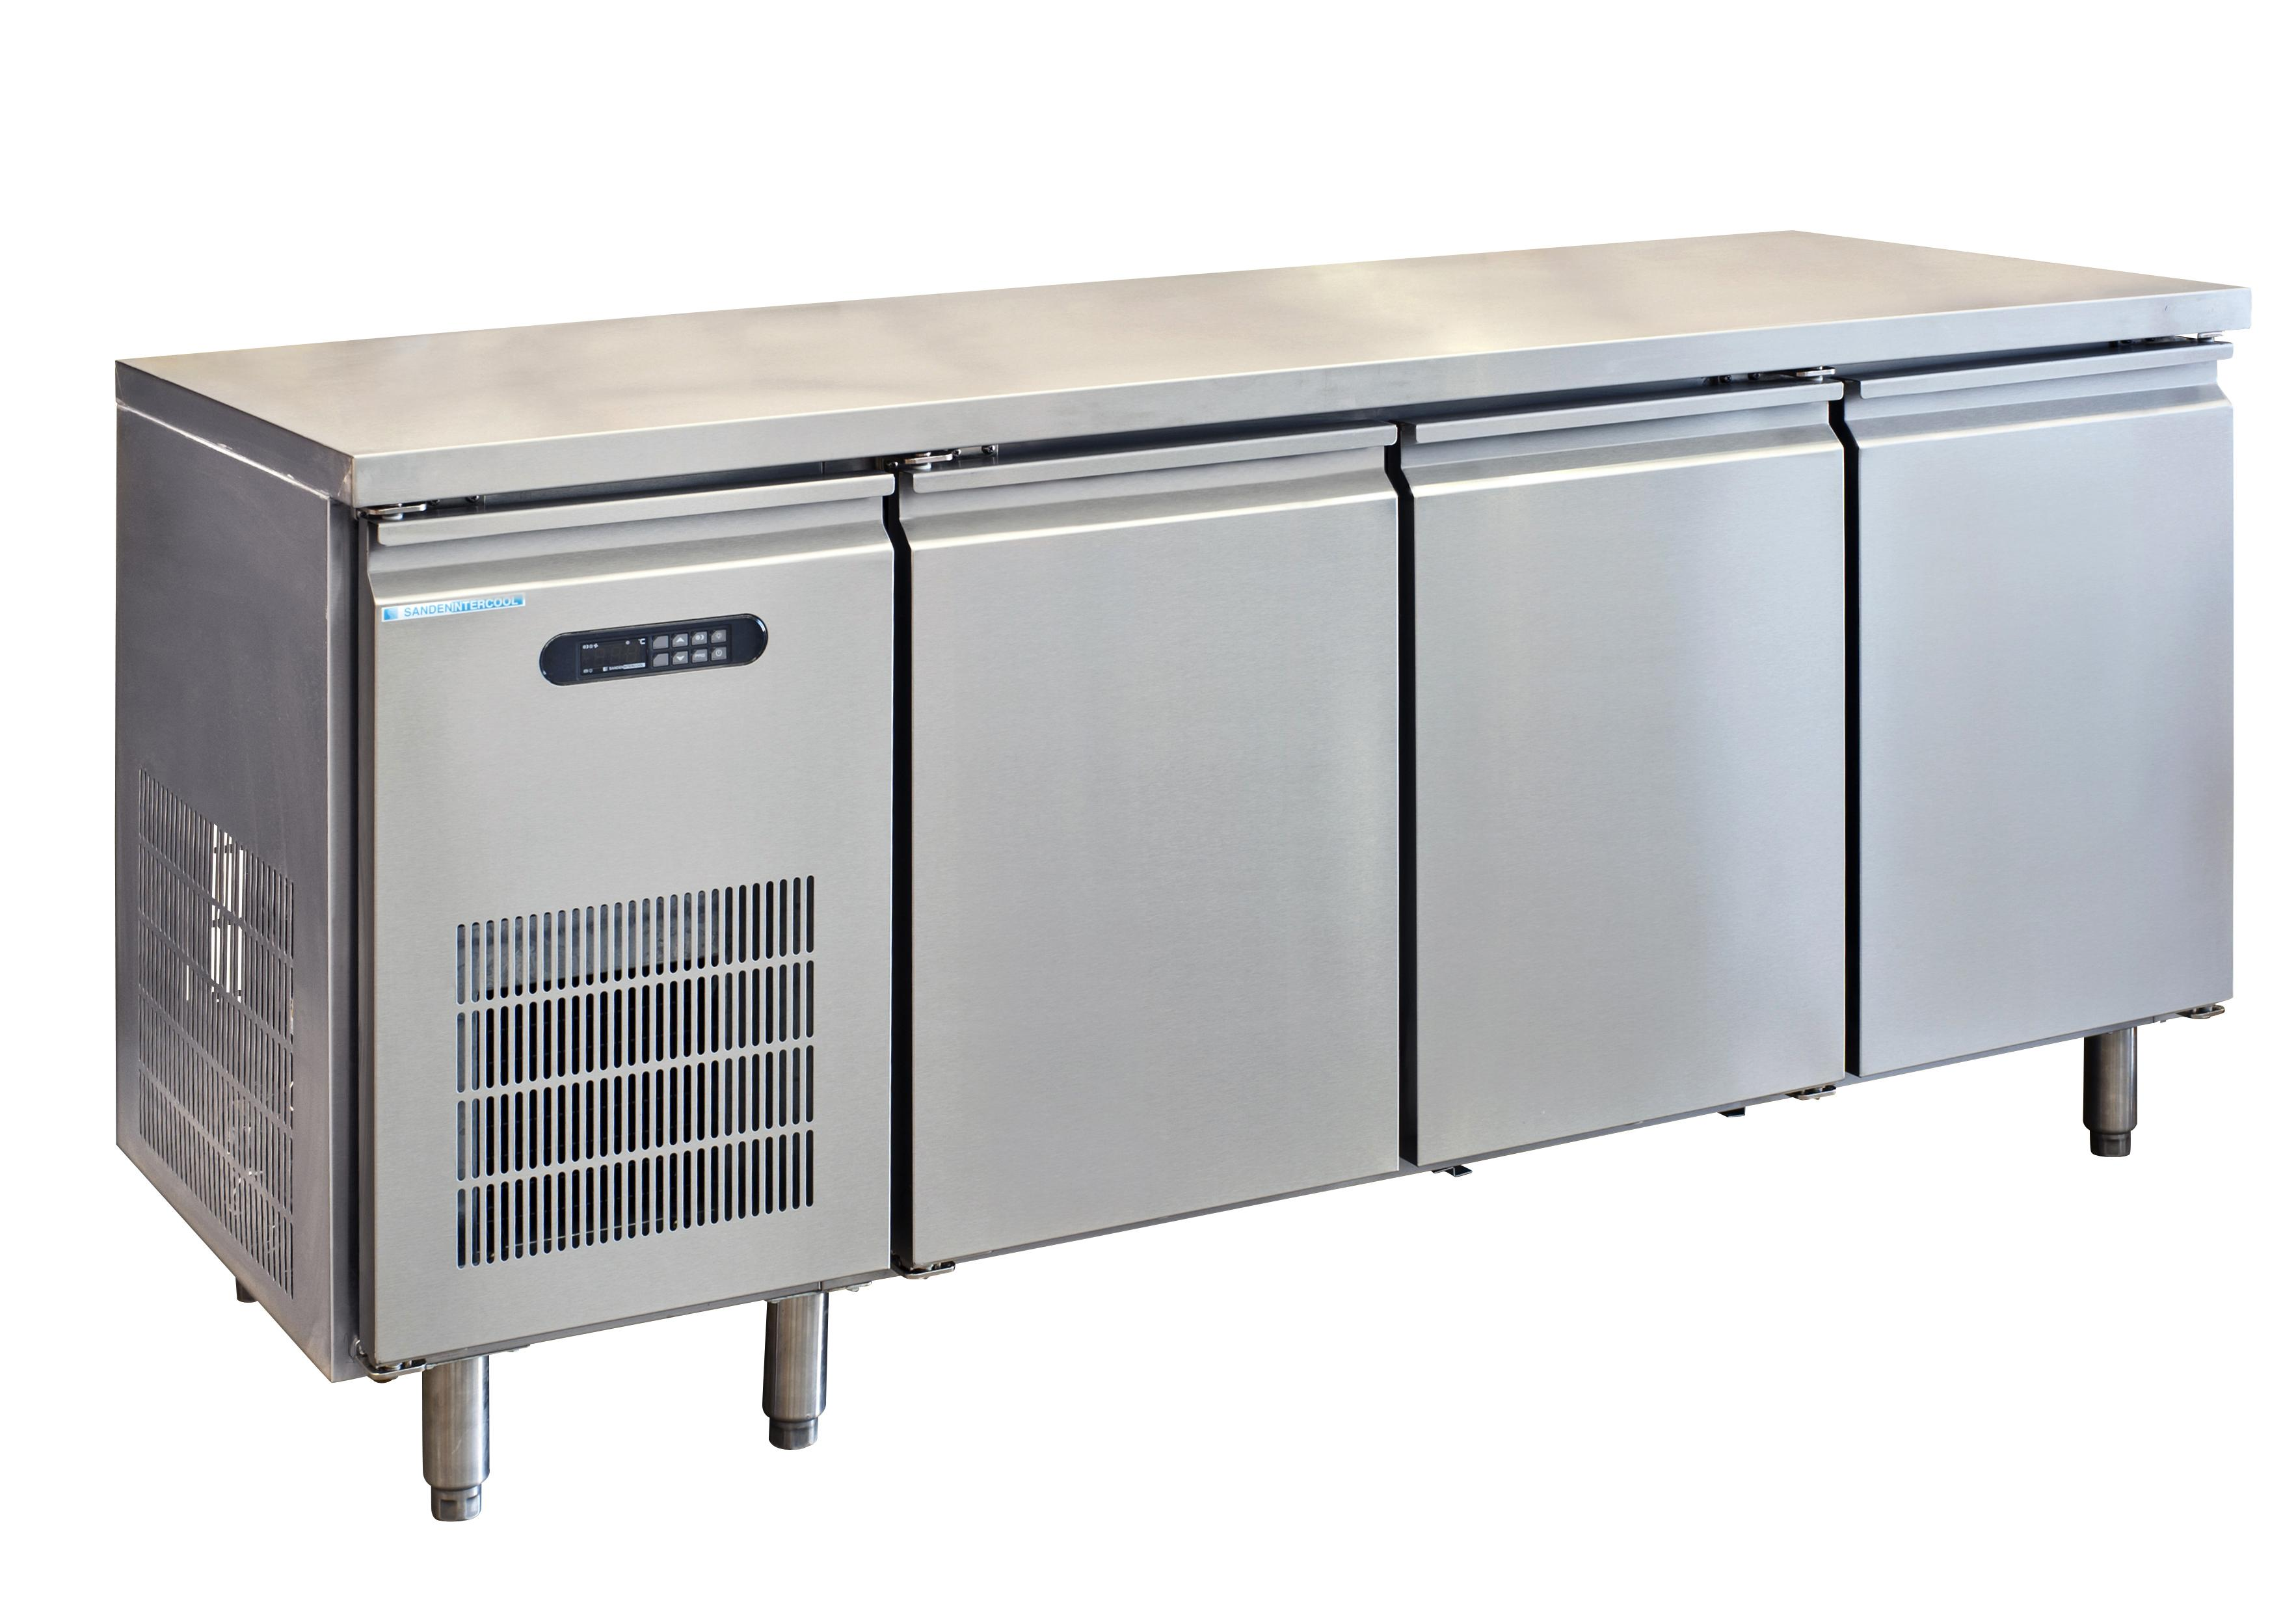 Refrigerator undercounter